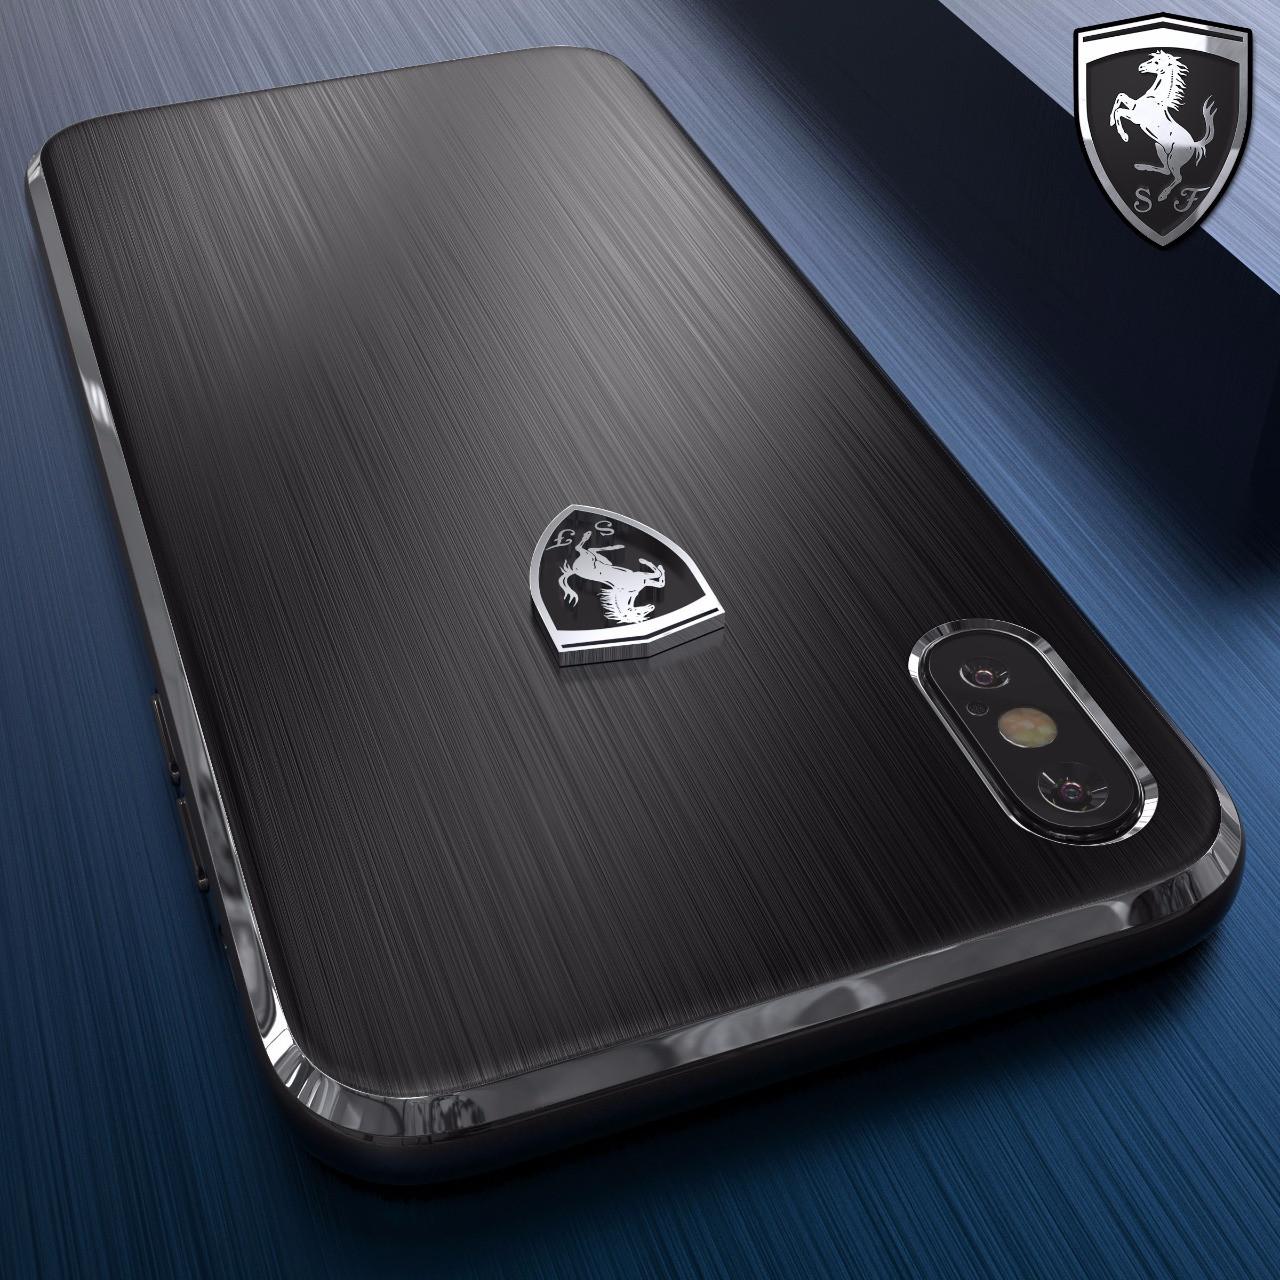 Ferrari ® Apple iPhone X California Metallic Edition ...